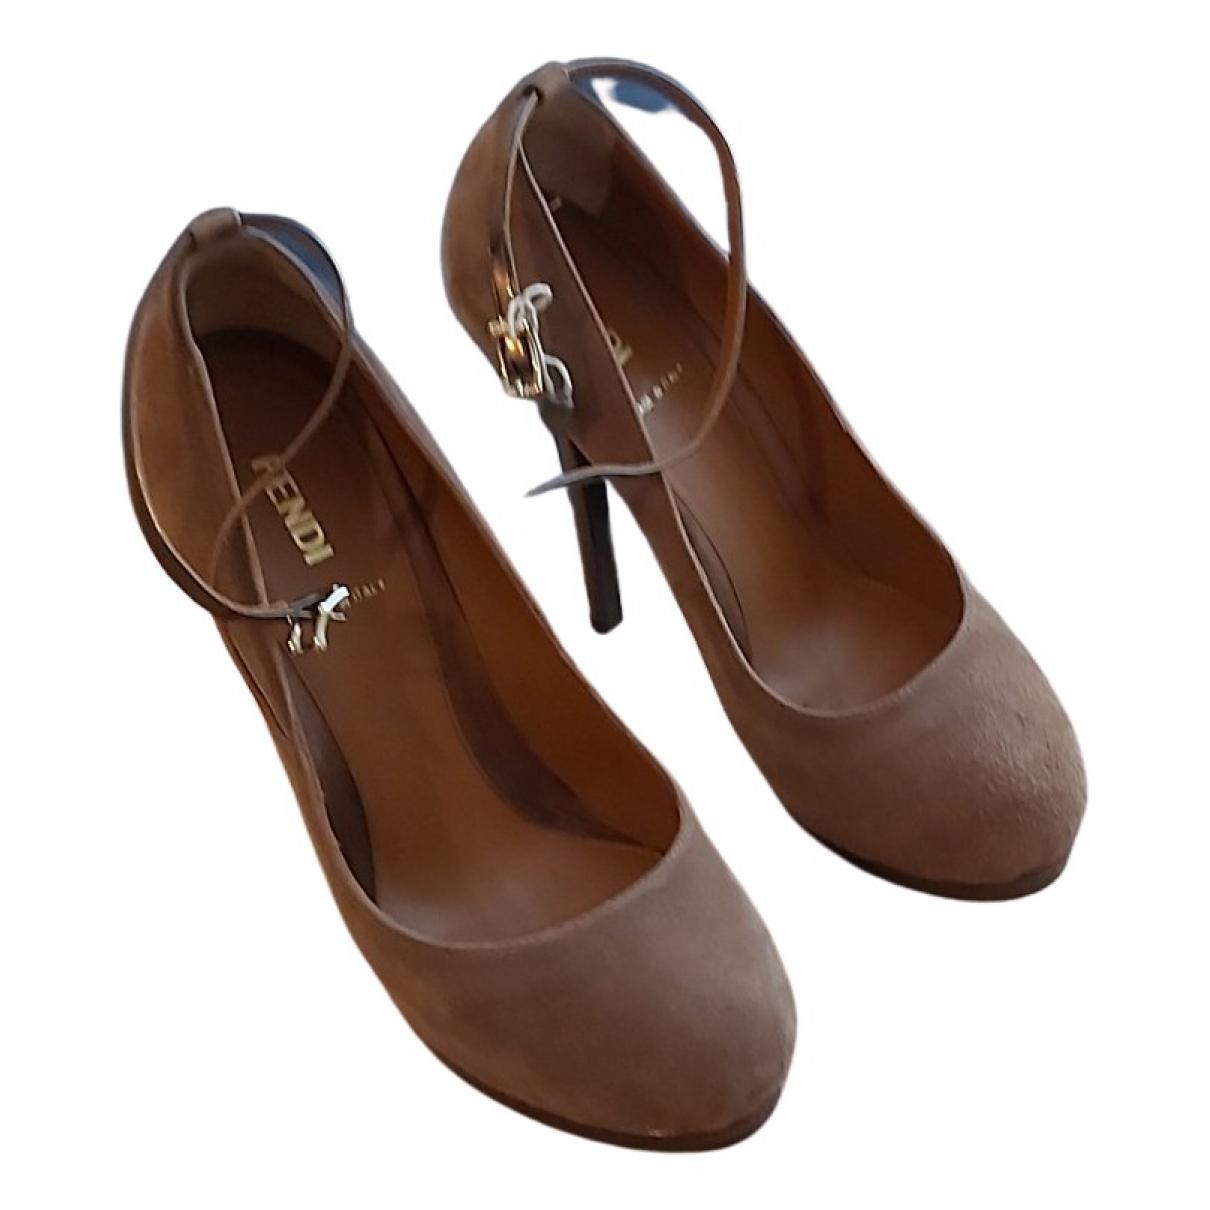 Fendi N Camel Leather Heels for Women 37.5 EU